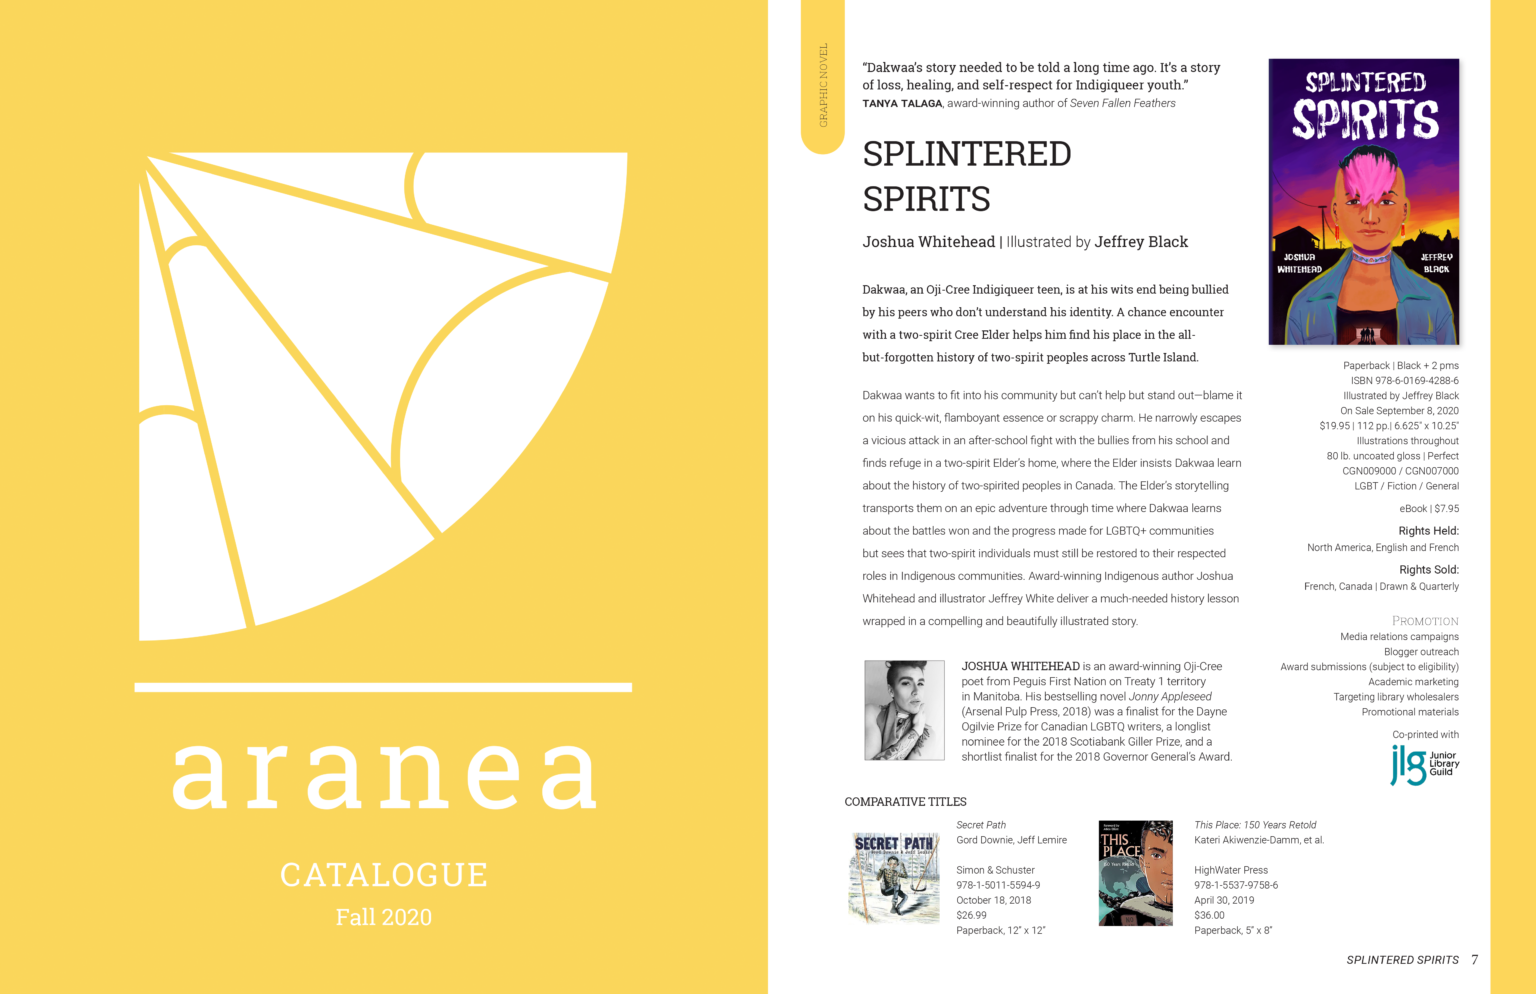 Aranea Press project materials – catalogue cover and Splintered Spirits tip sheet